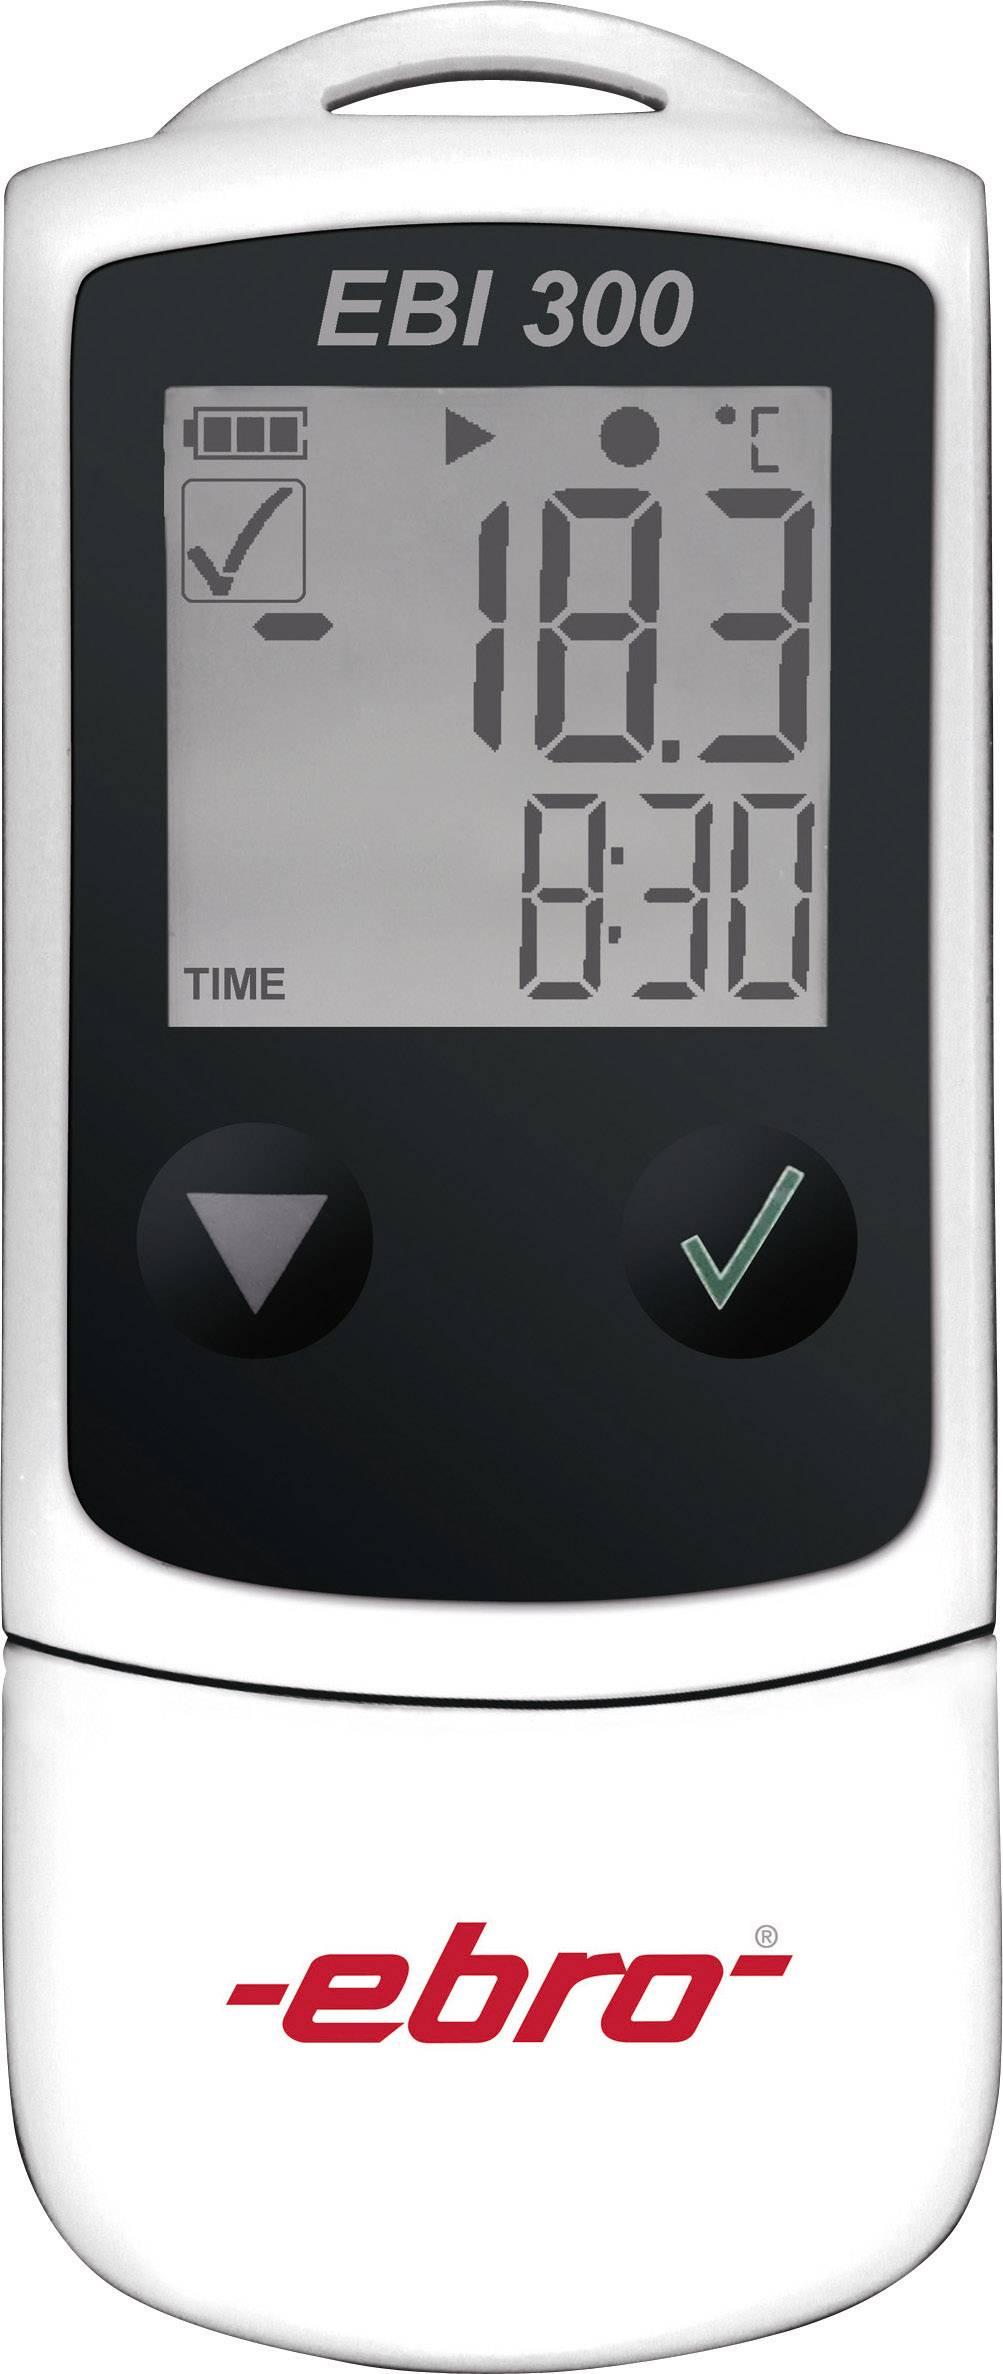 Teplotný datalogger ebro EBI 300, -30 až +60 °C